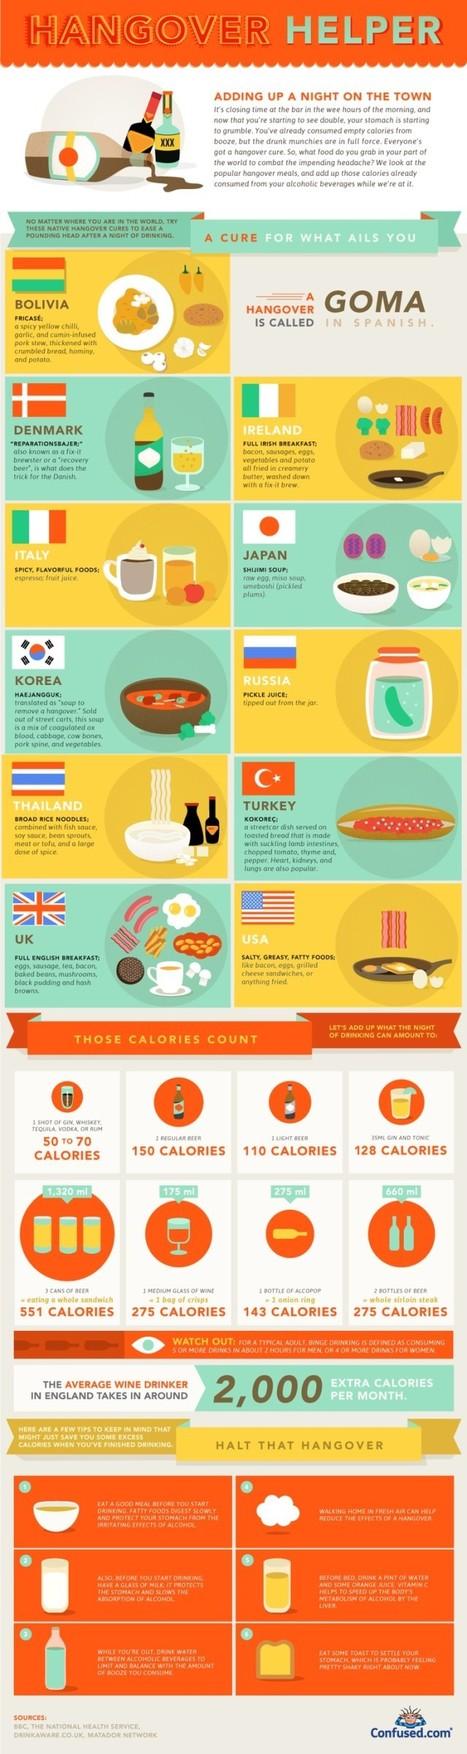 The Hangover Helper [Infographic} | BestInfographics.co | The Best Infographics | Scoop.it